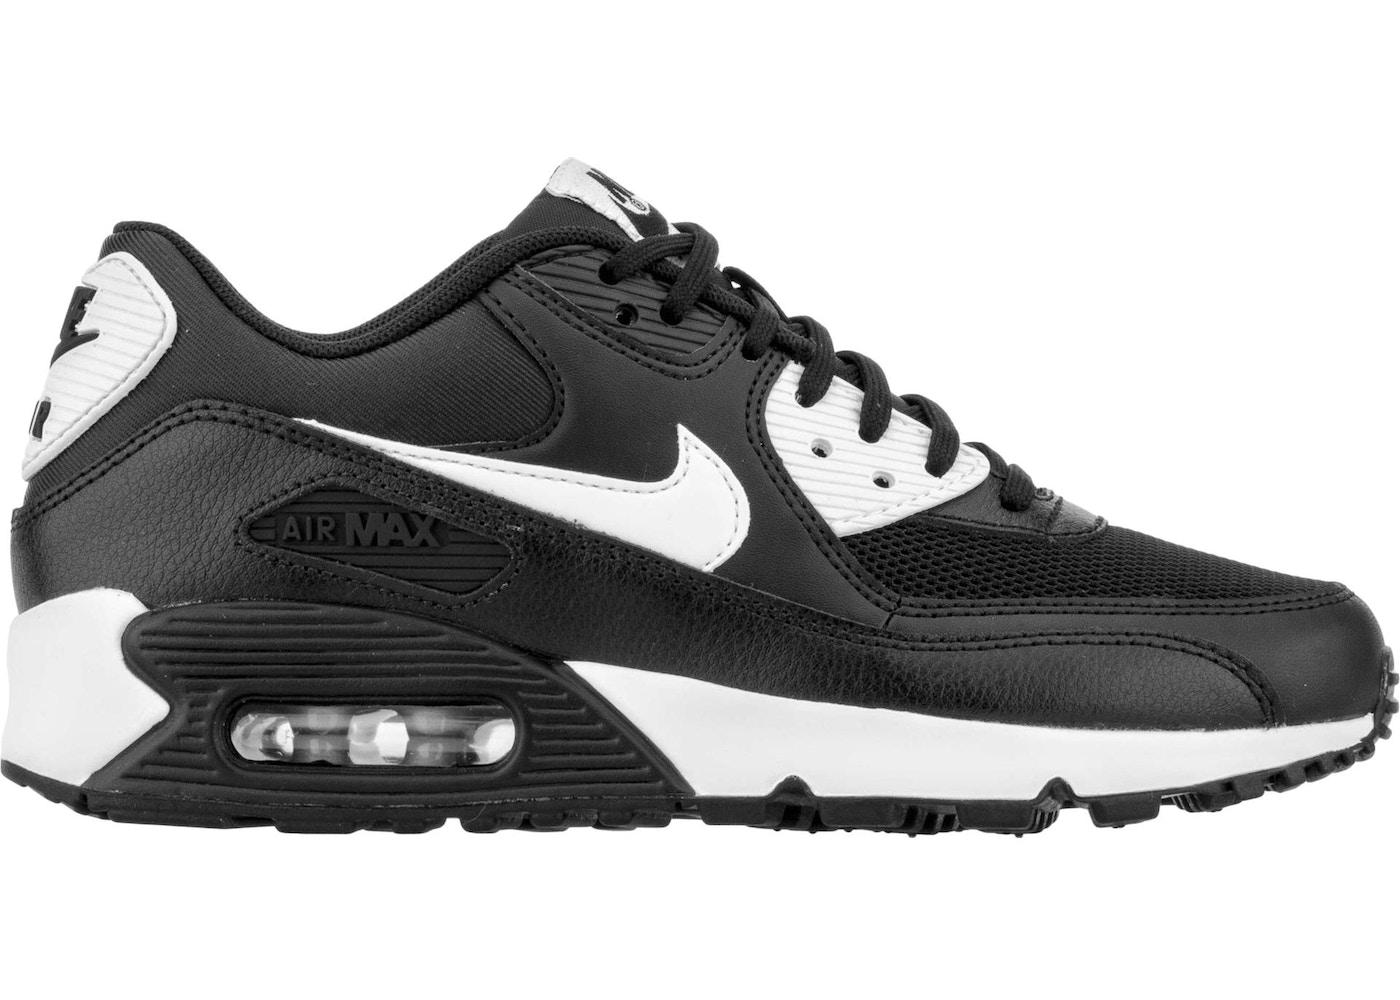 Nike Air Max 90 Essential Black White (W)